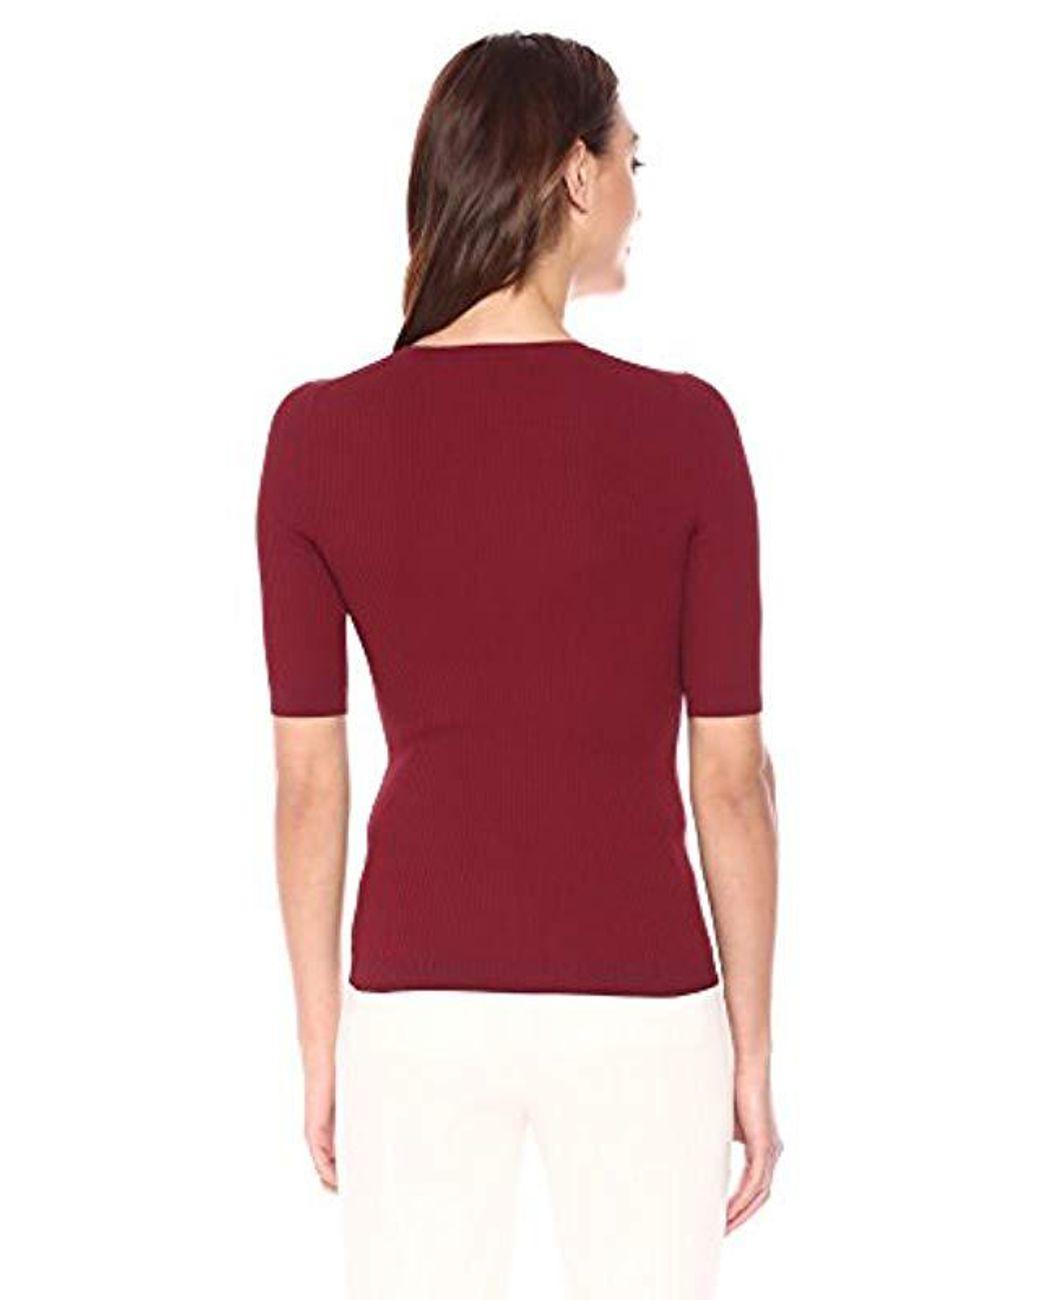 Theory Short Sleeve Tech Rib Crewneck Sweater in Deep Brick